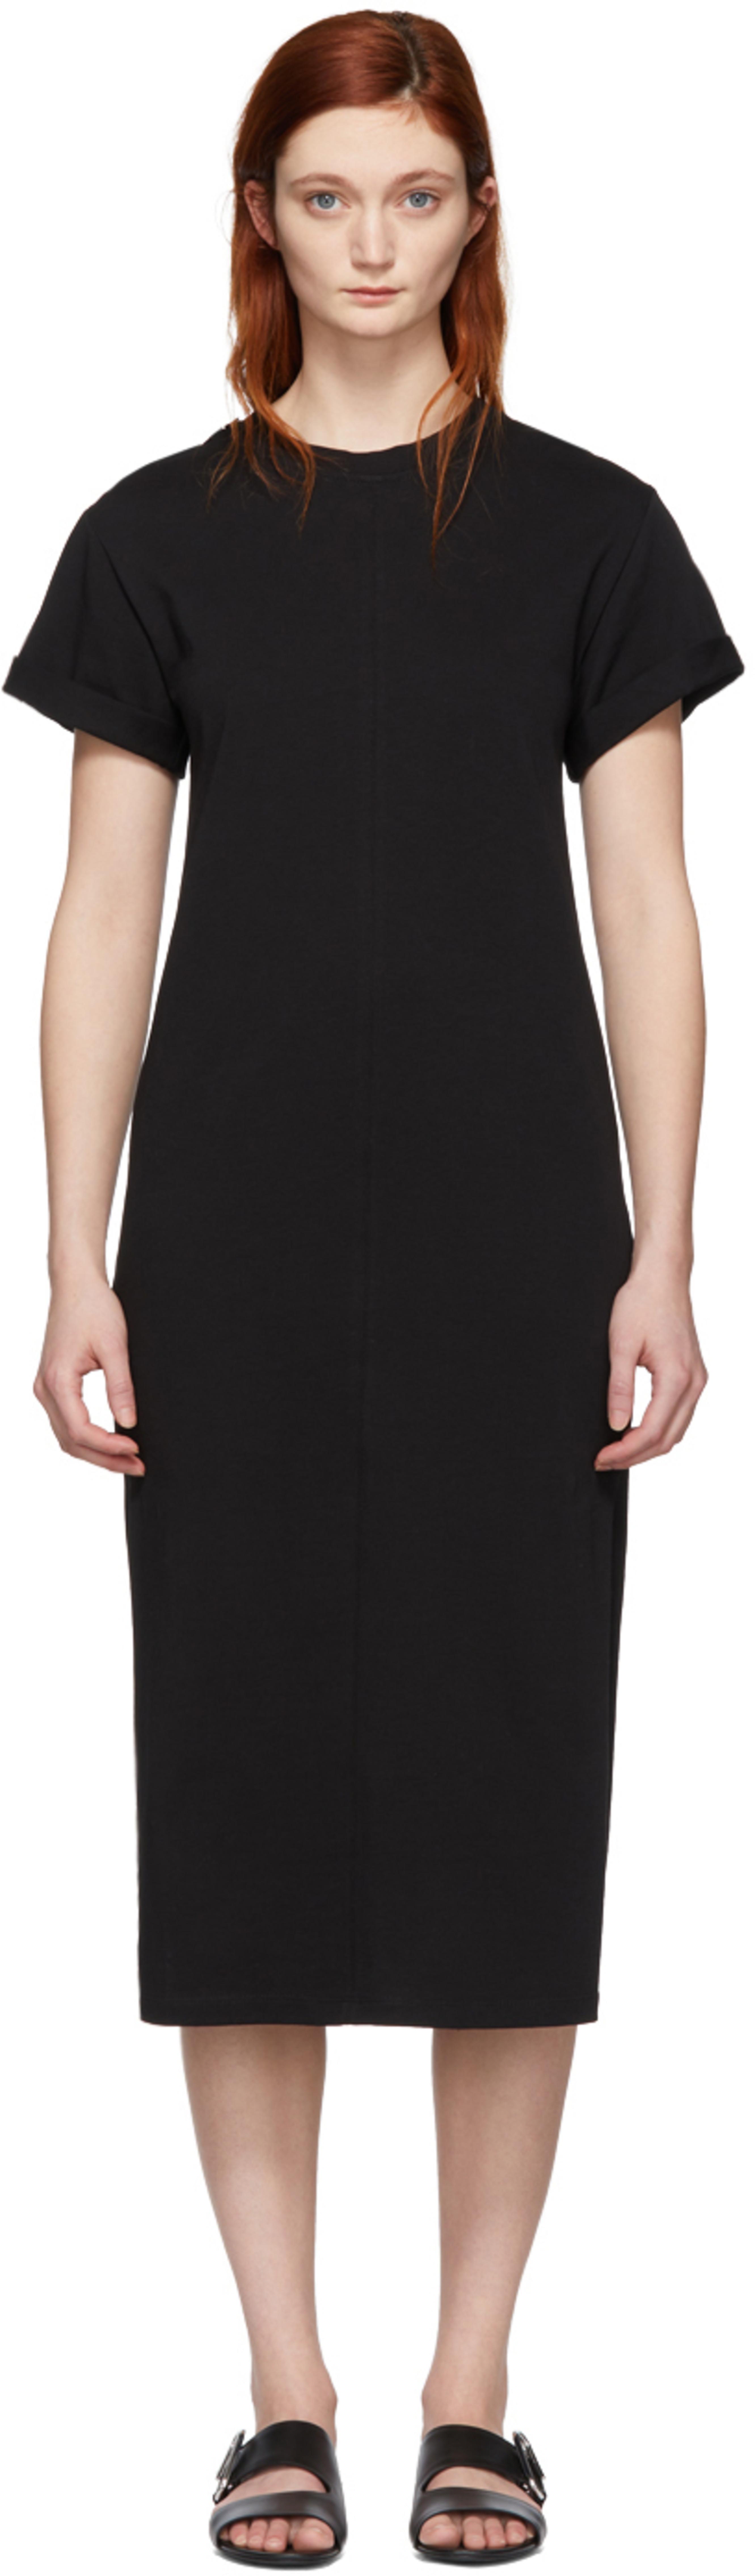 62bda30f84524 3.1 Phillip Lim dresses for Women | SSENSE